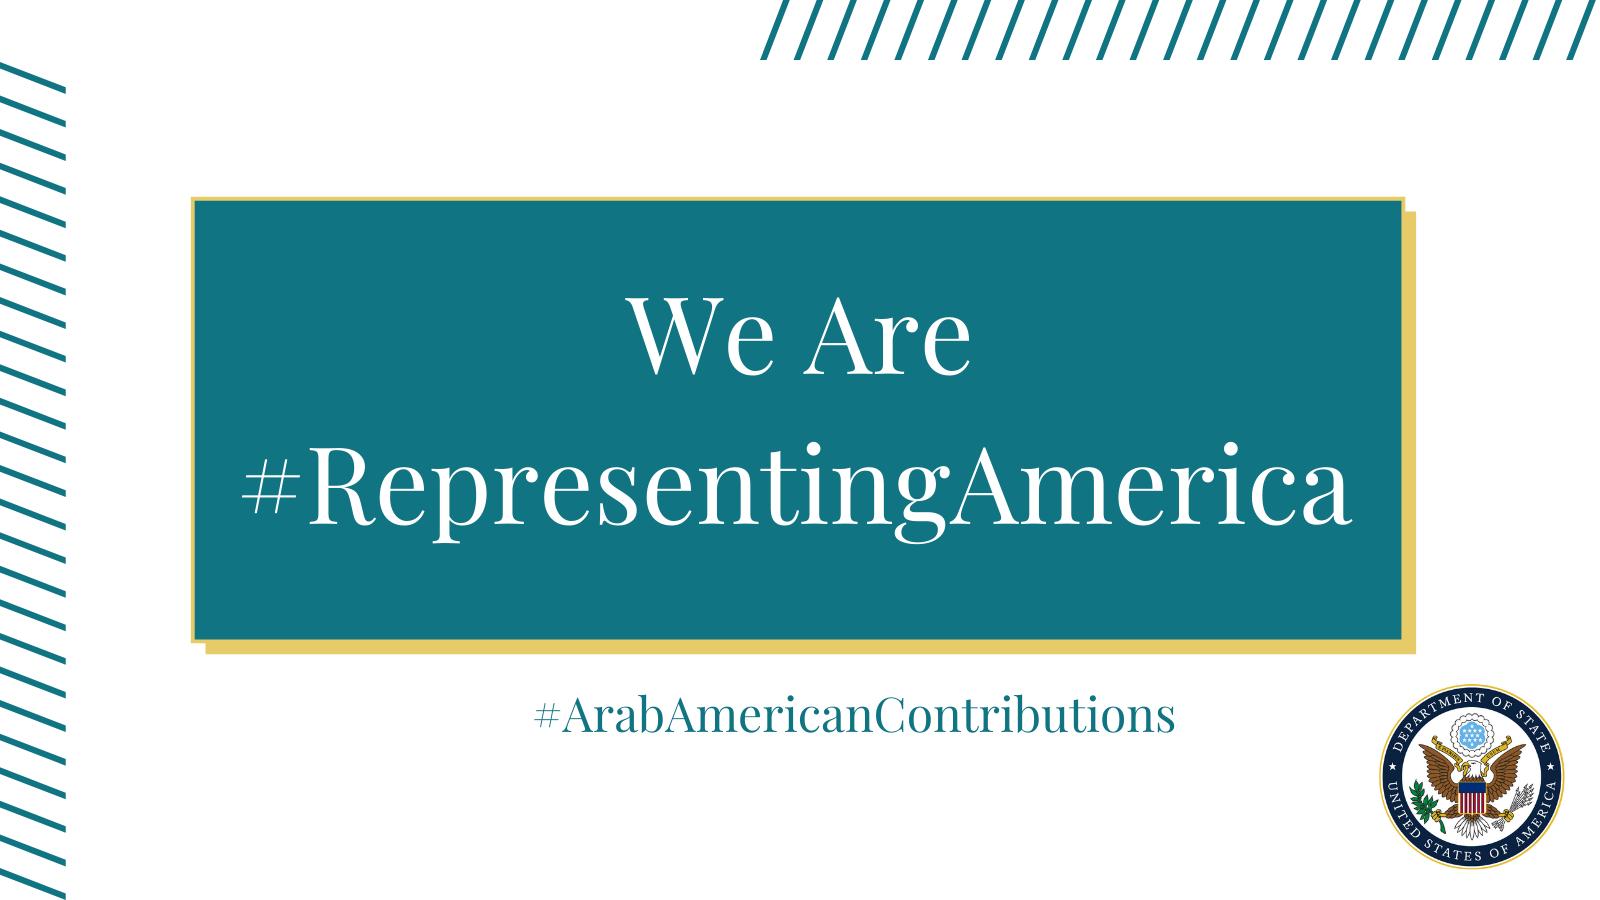 Graphic: We Are #RepresentingAmerica #ArabAmericanContributions